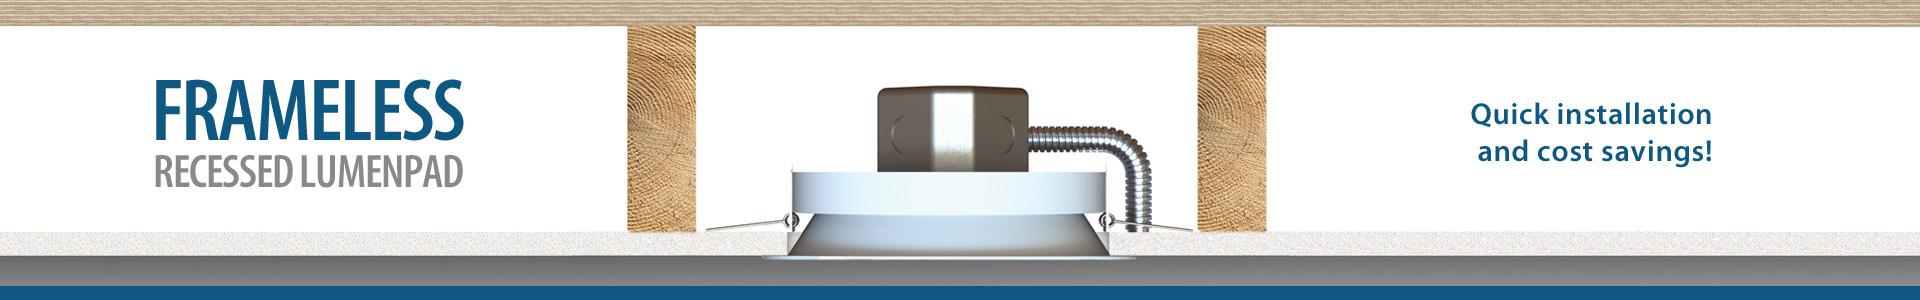 Liton | LCRMPD7R | 8 Round LumenPad Recessed LED Downlight - 1400lm